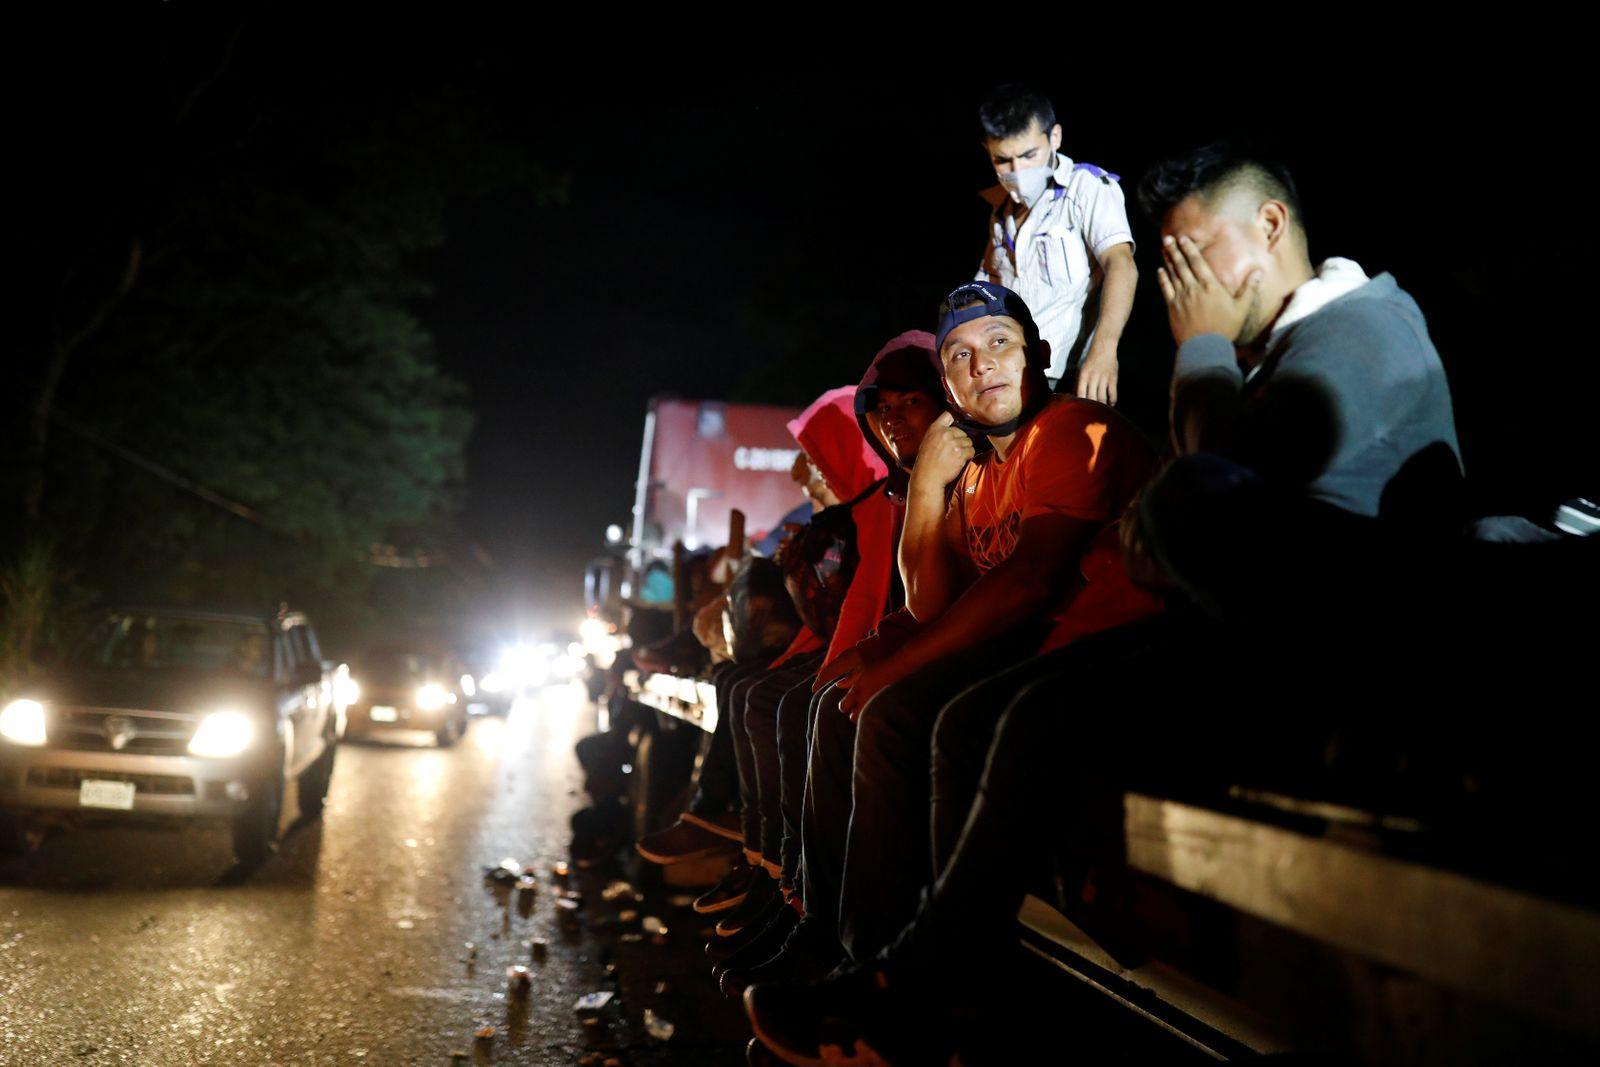 Honduran migrants trying to reach the U.S. hitchhike on a truck, through Izabal department